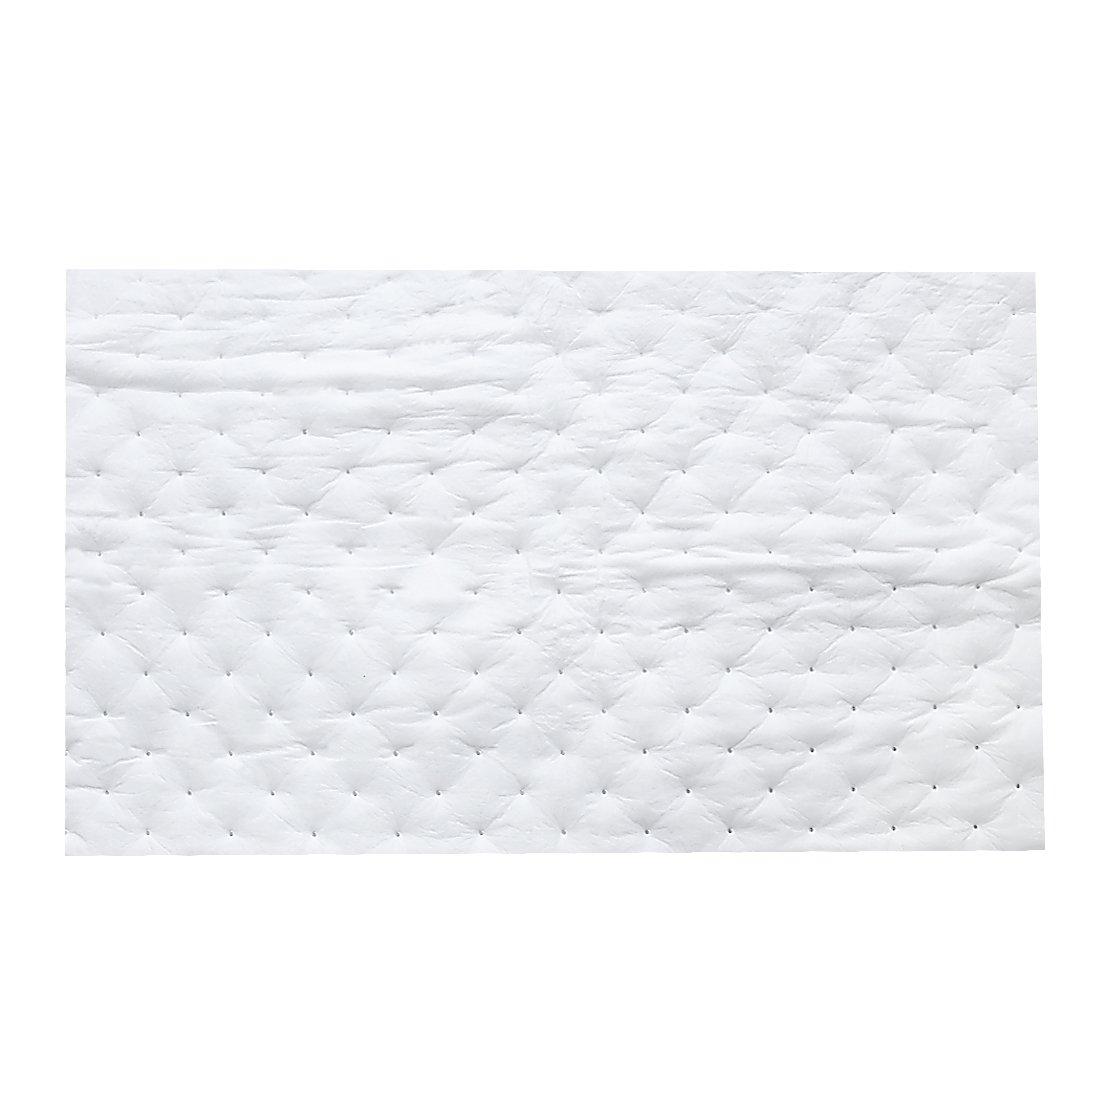 uxcell White Car Heat Insulation Self Adhesive Mat Sound Proof Mat 80 x 50CM